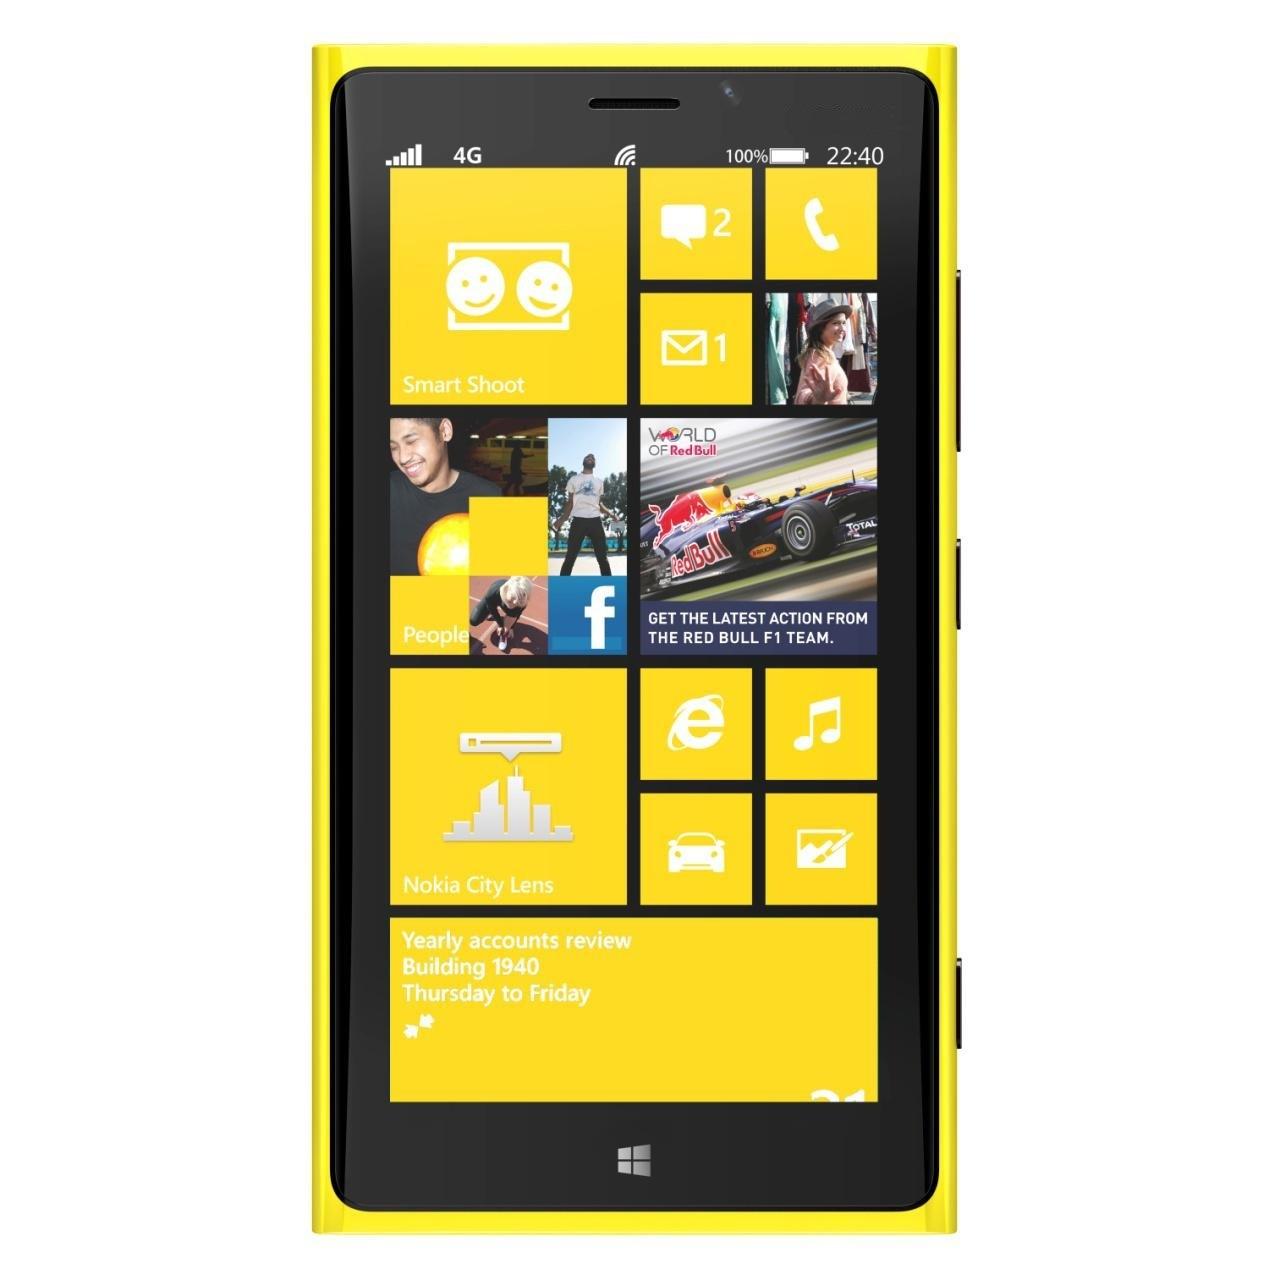 Original Unlocked Cheap Hot Sale Lumia 920 Mobile/Cell/Smartphone